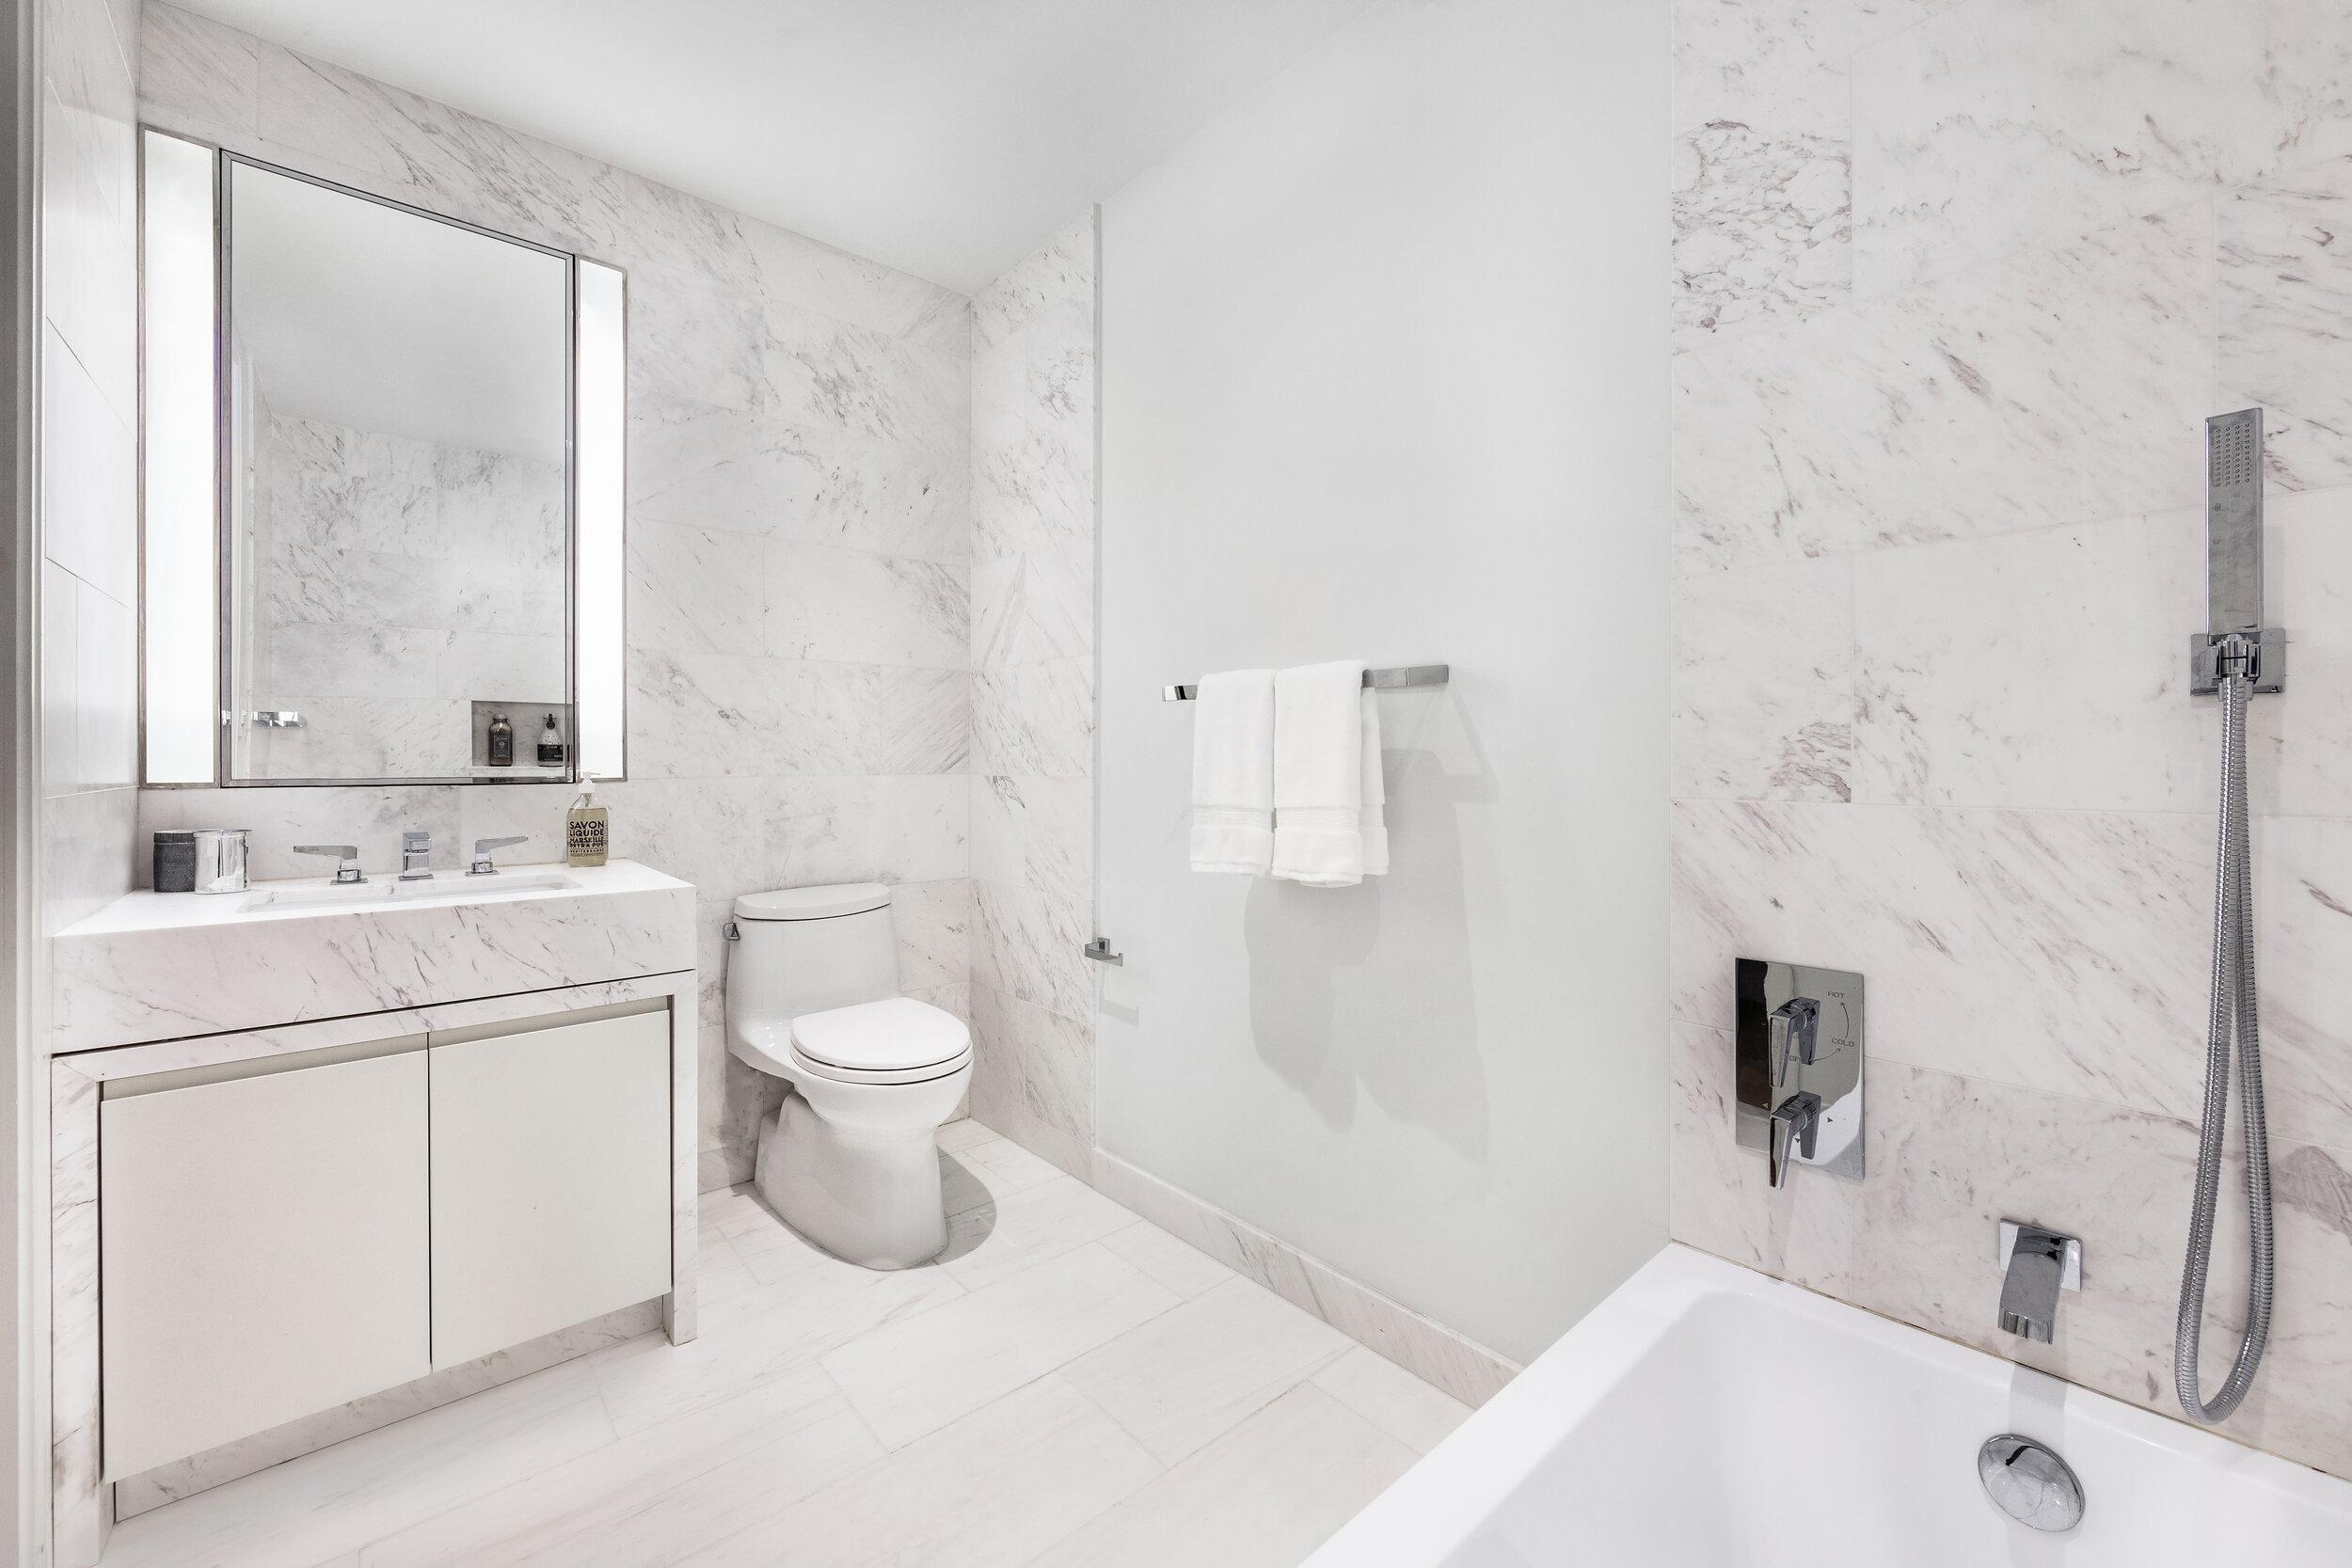 6A bathroom 2 - High res.jpg